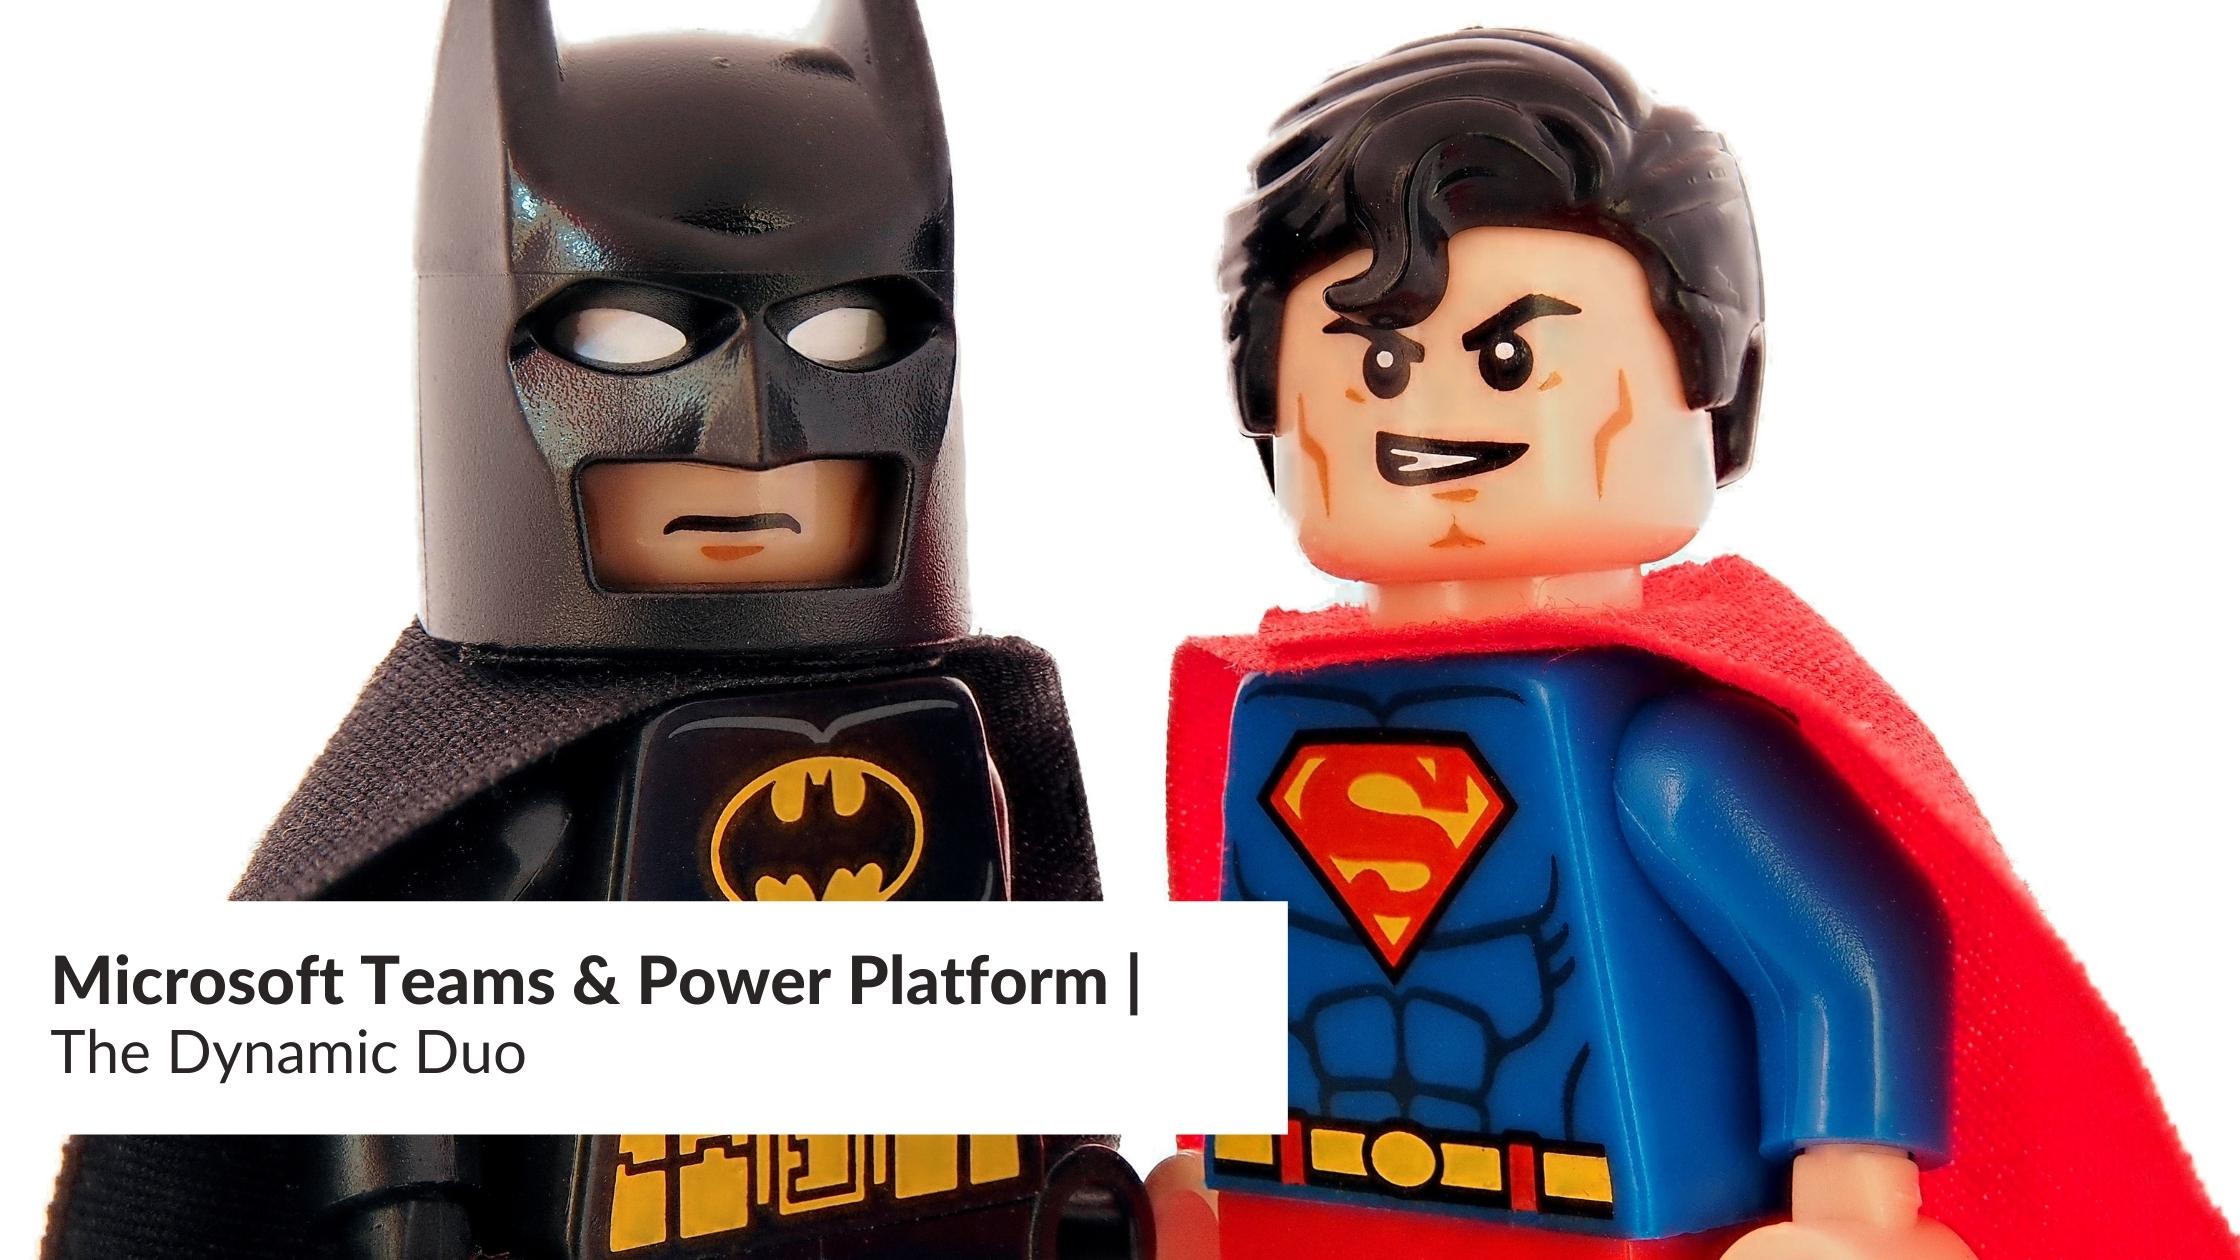 Microsoft Teams & Power Platform | The Dynamic Duo